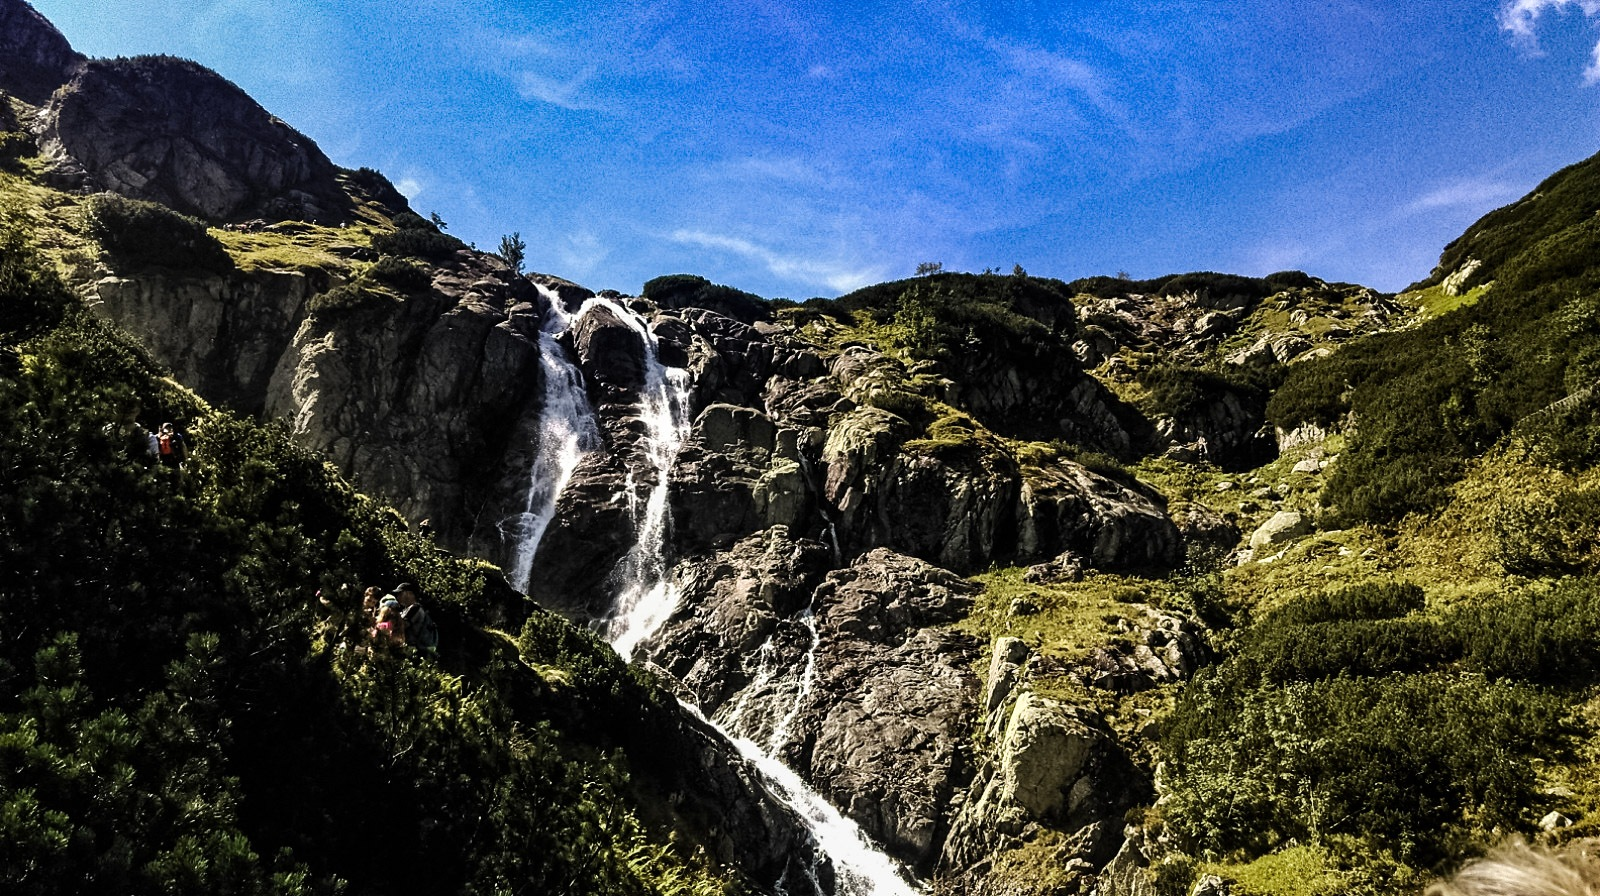 Waterfall by Monika Oko